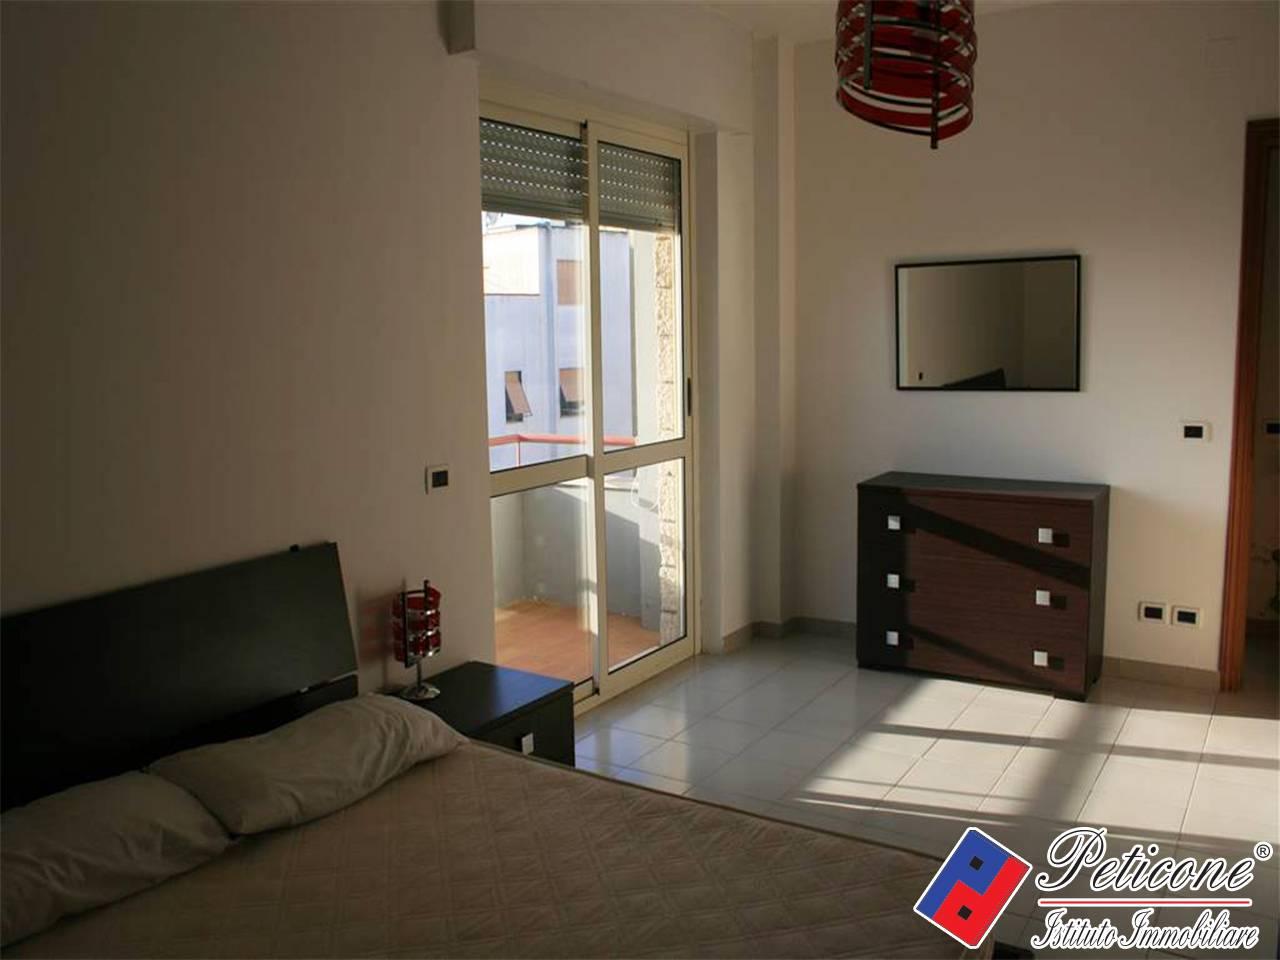 Appartamento in Vendita a Gaeta: 4 locali, 91 mq - Foto 6